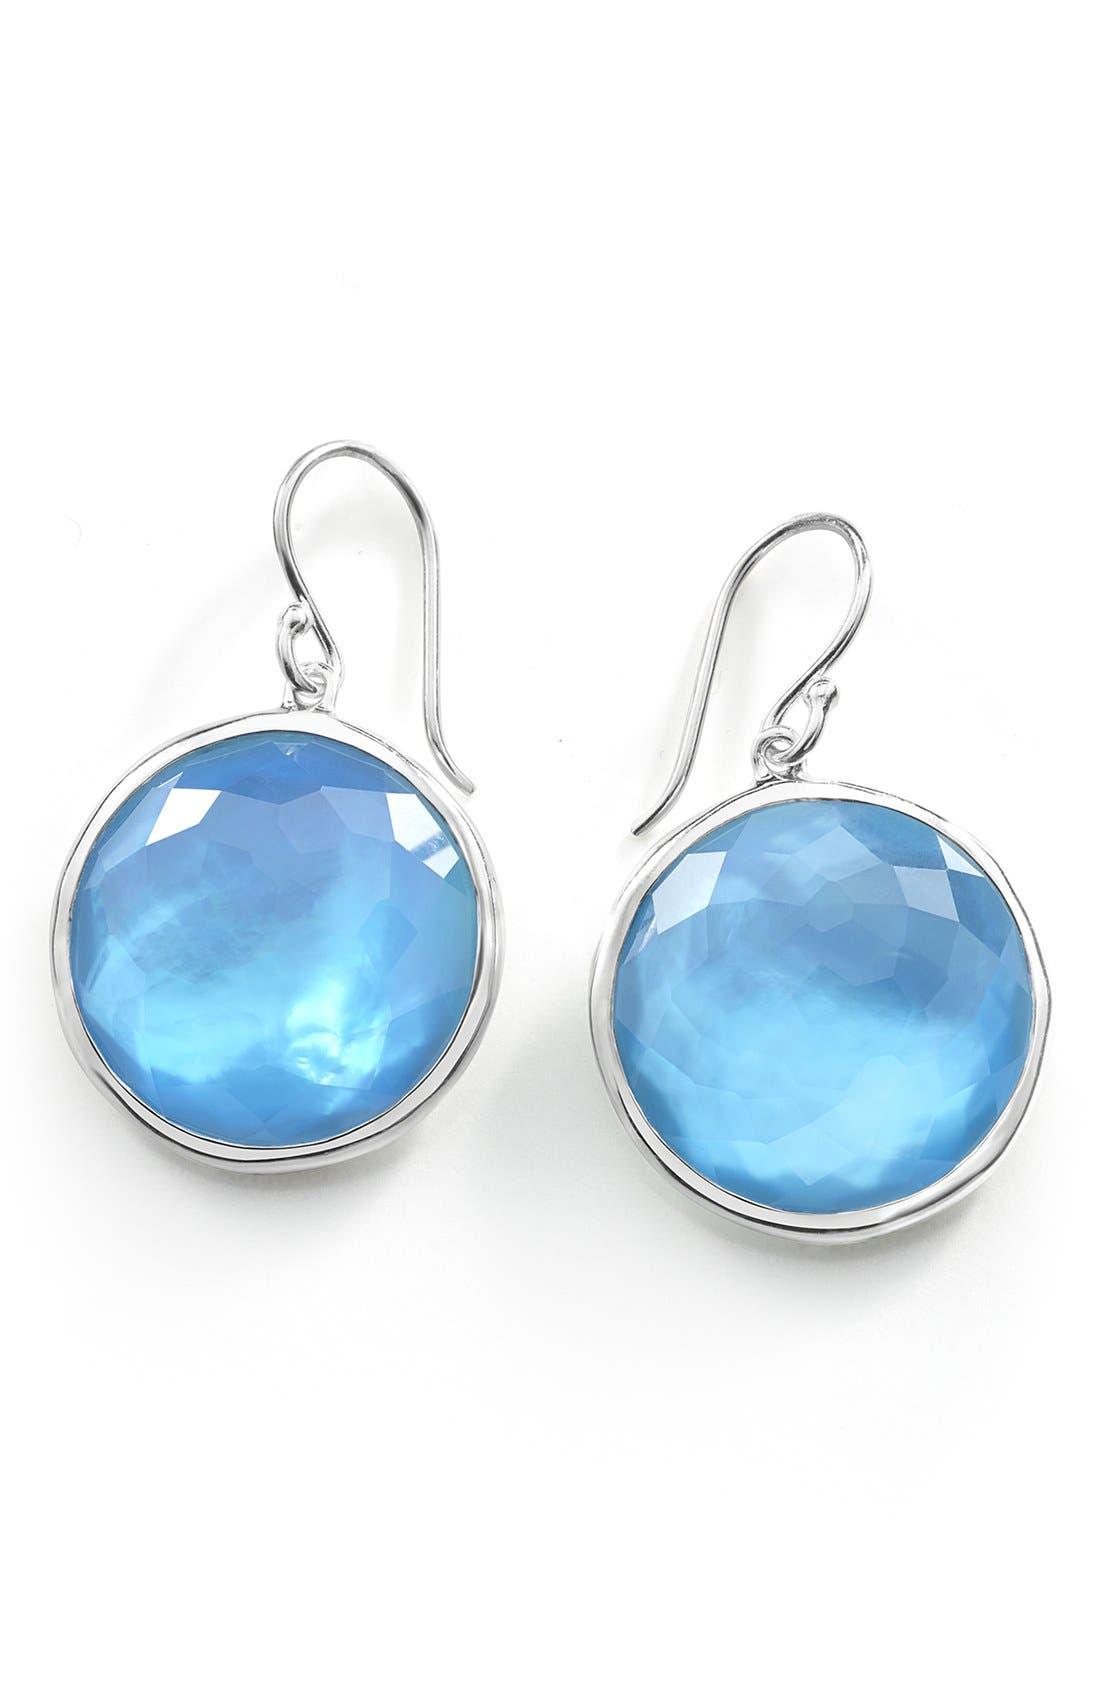 Main Image - Ippolita 'Rock Candy' Large Stone Drop Earrings